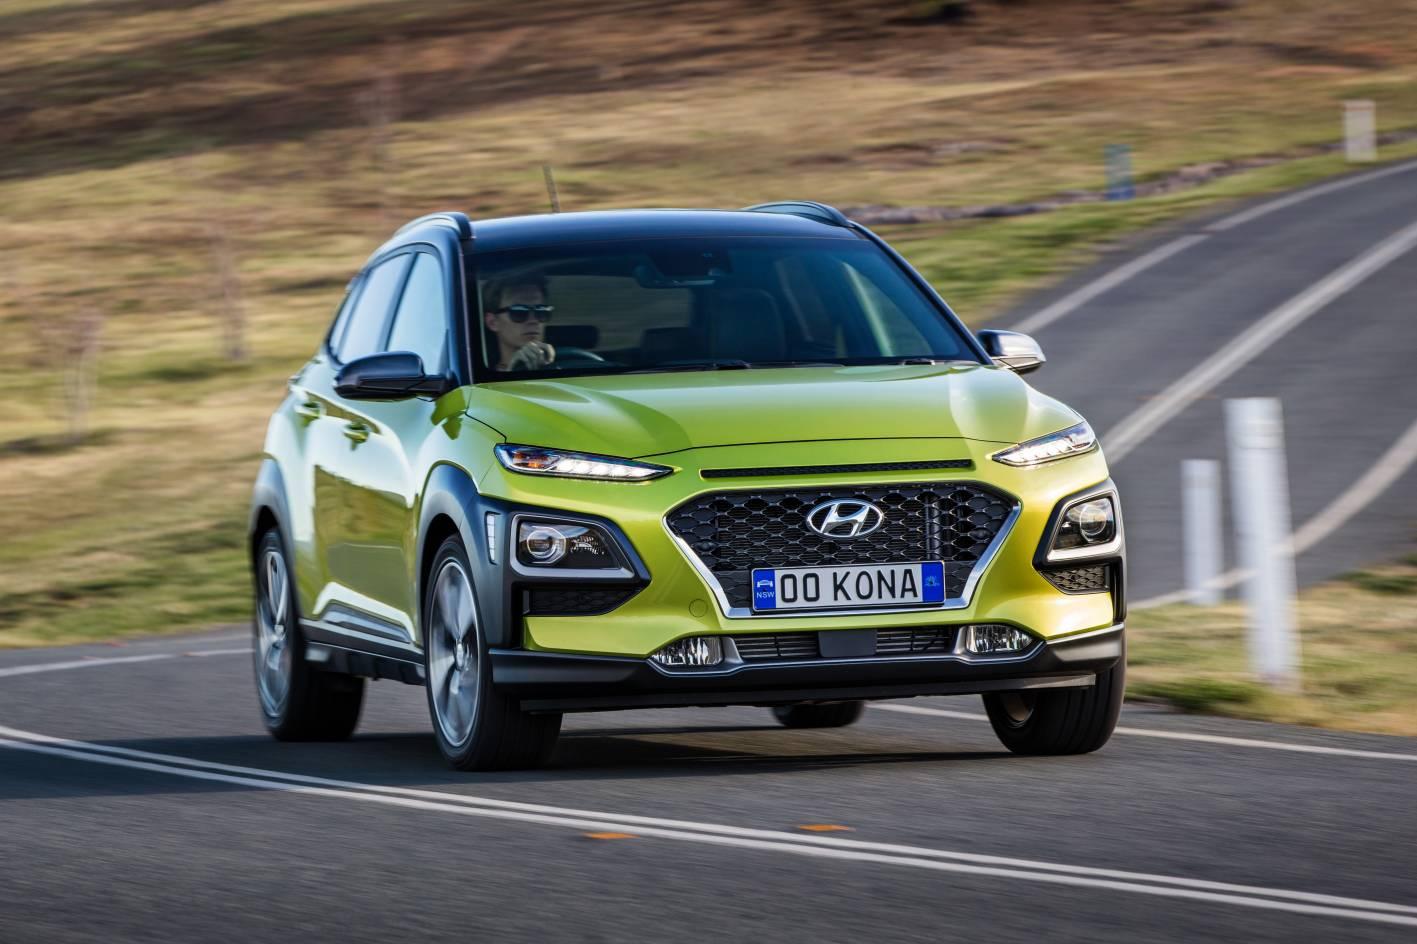 Hyundai Kona On Sale Now From 27 000 Drive Away